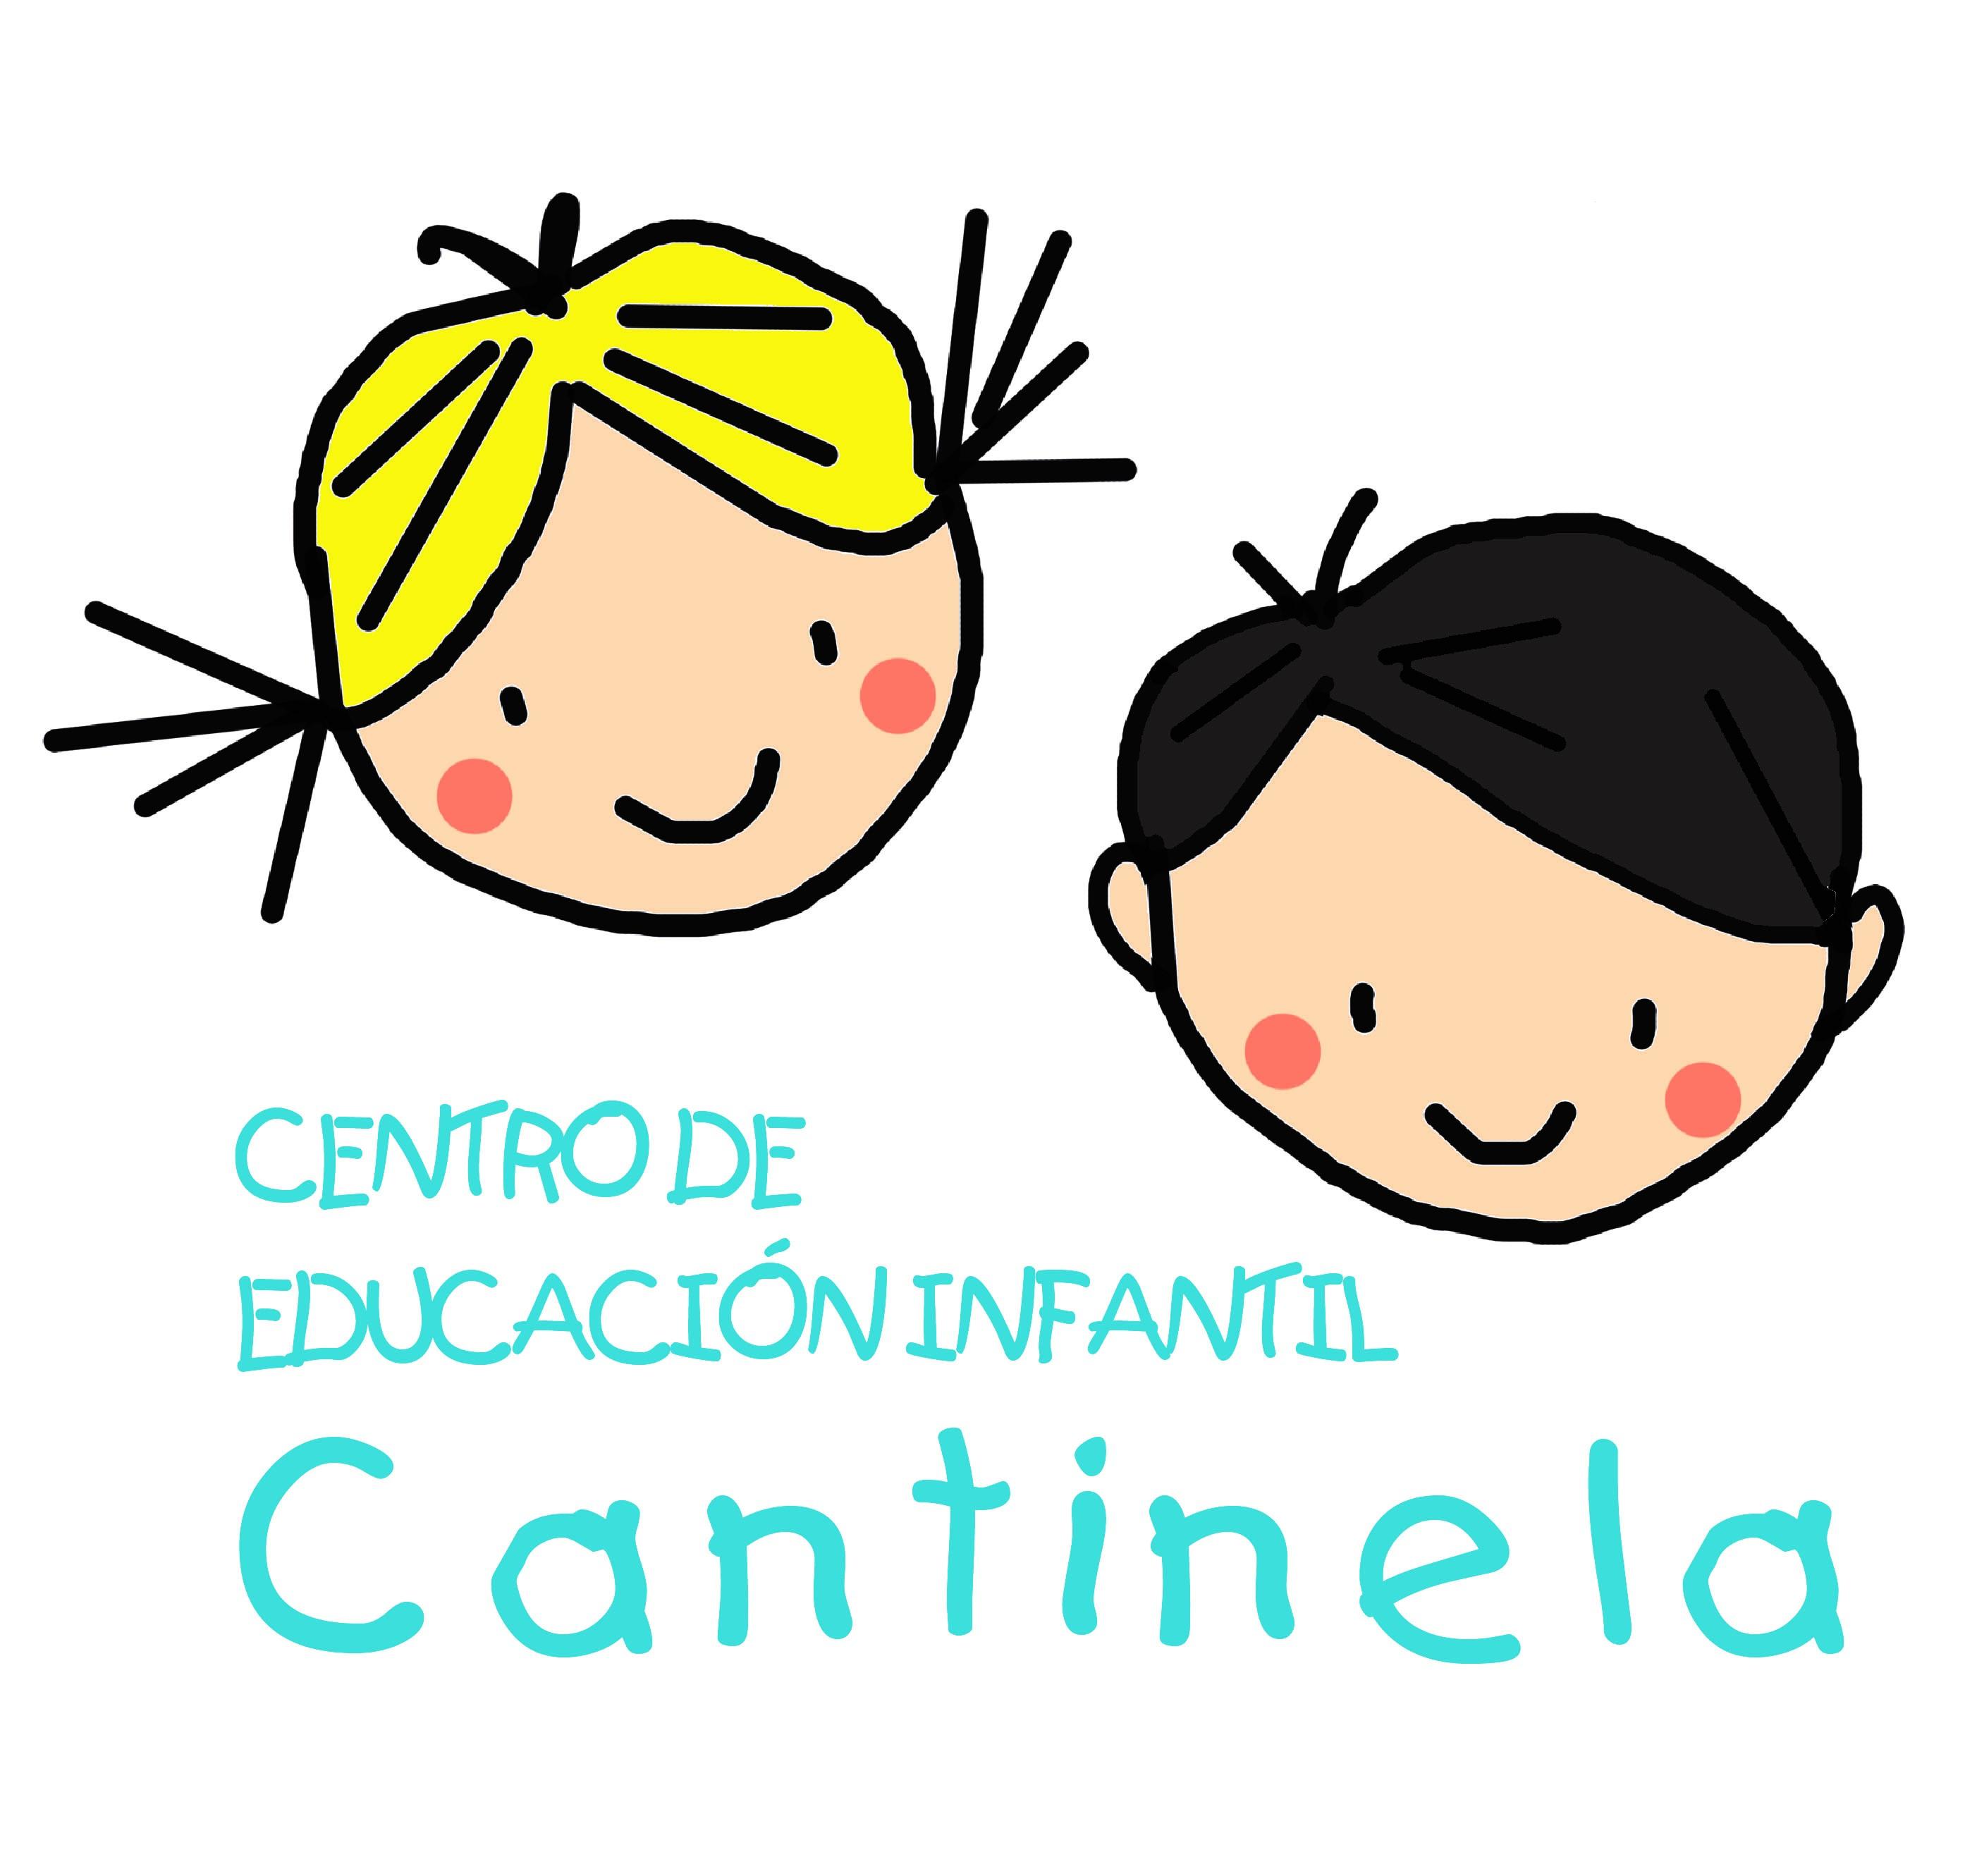 LOGO CENTRO INFANTIL CANTINELA